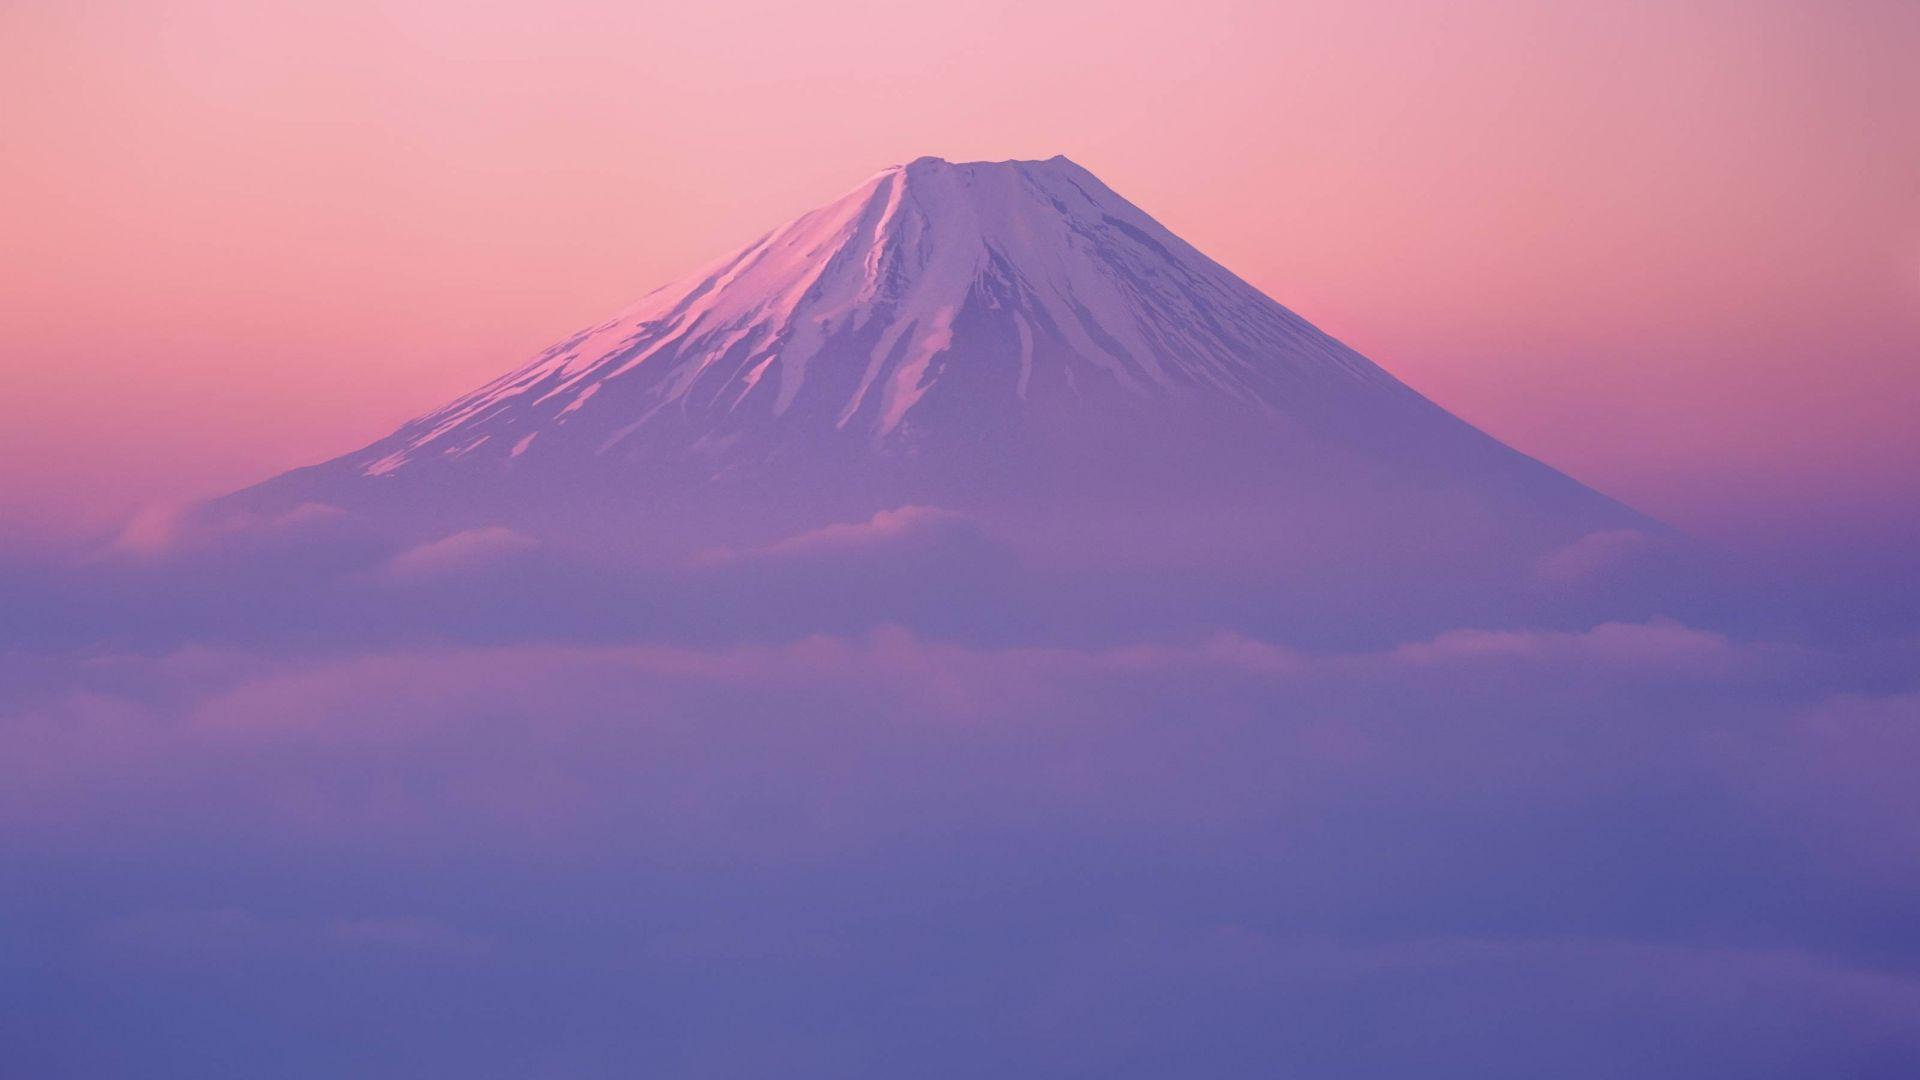 Wallpaper Mount fuji, clouds, nature, hd